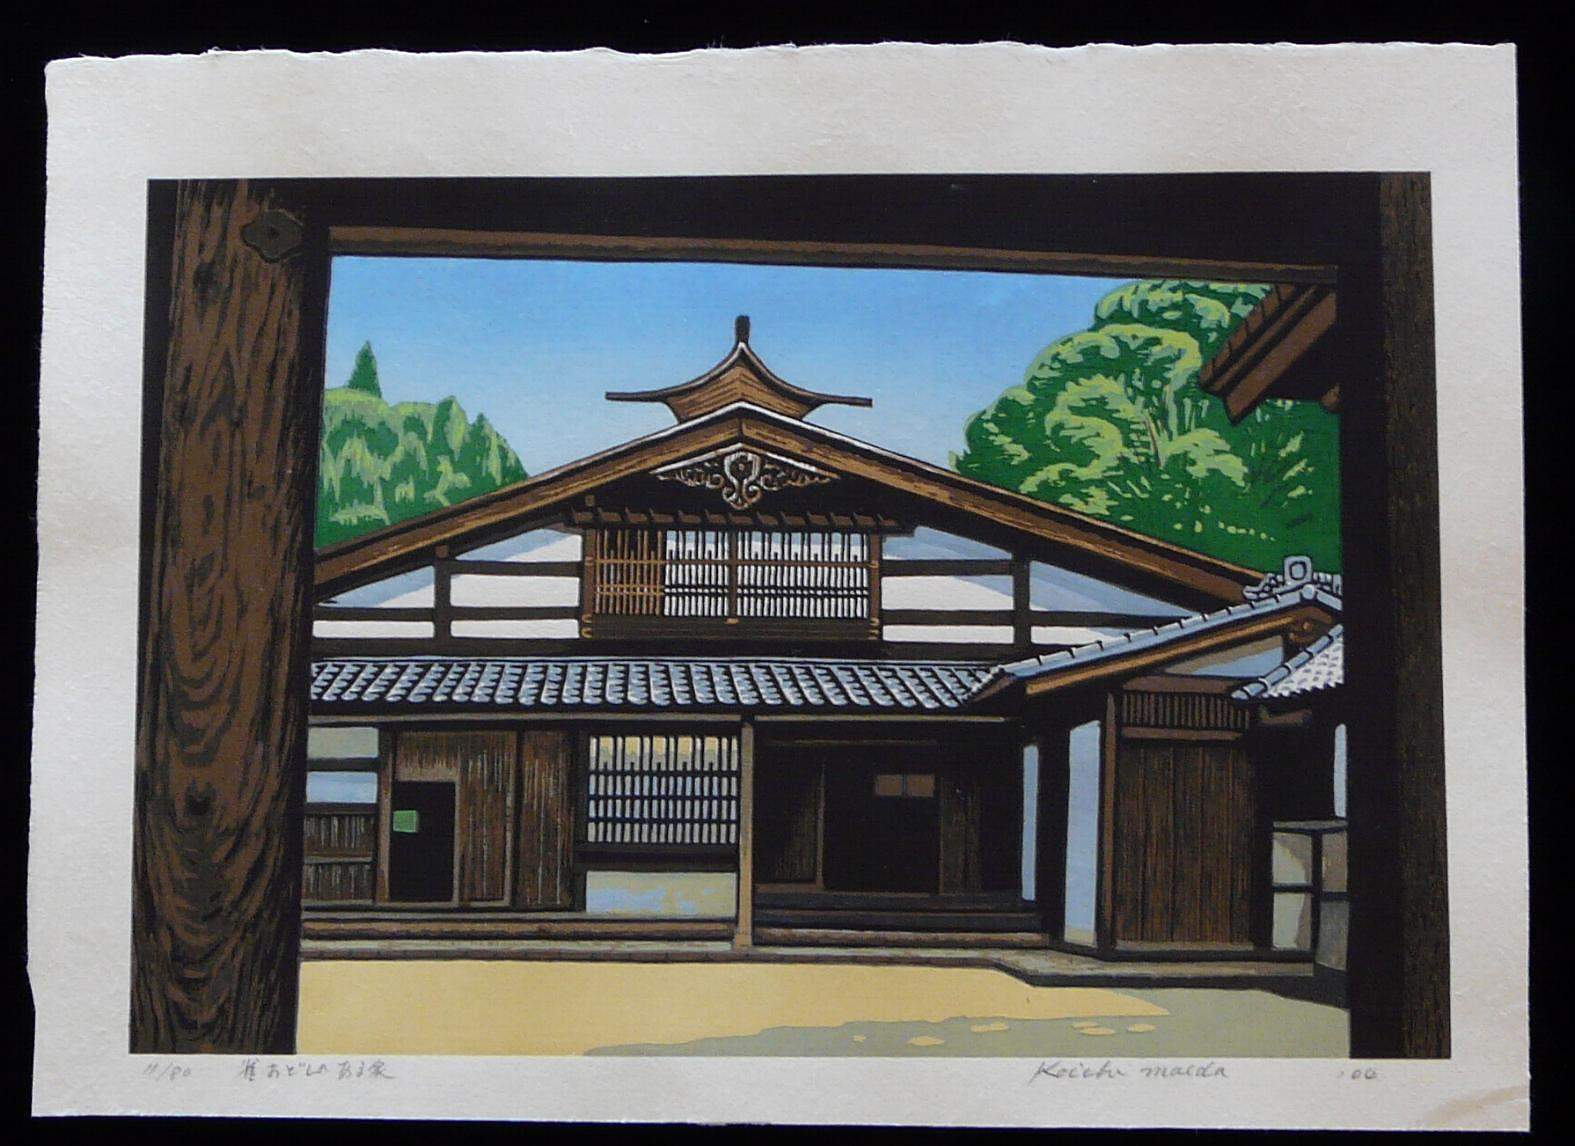 Maeda, Koichi: #P2870 TRADITIONAL HOUSE IN RURAL JAPAN